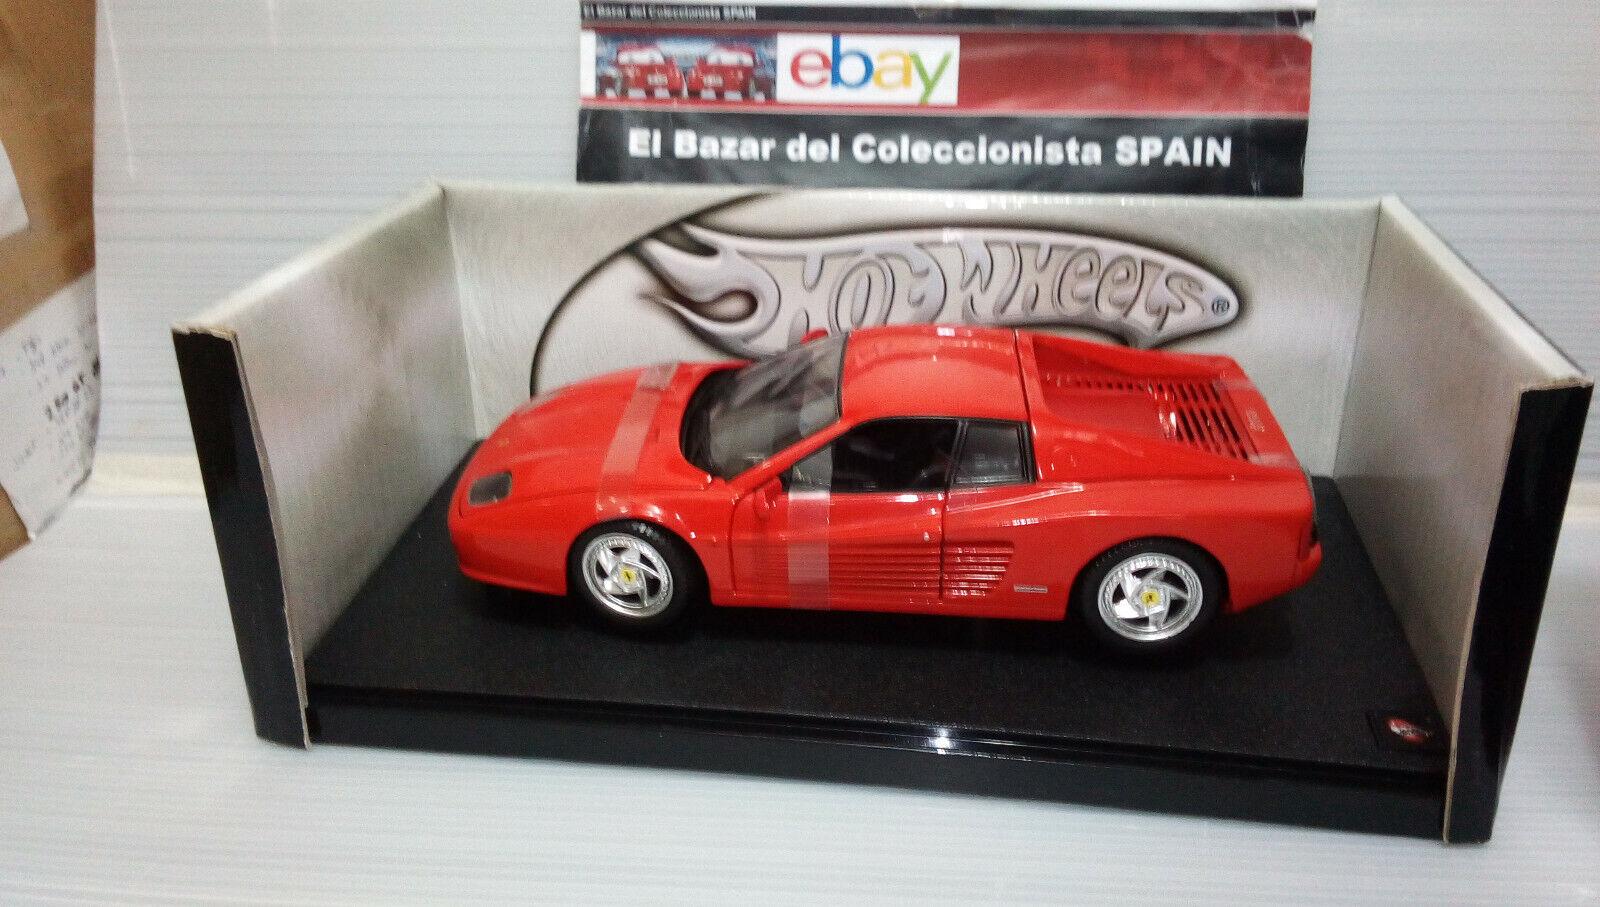 salida 1 18 Ferrari 512 512 512 TeEstrellaossa -   Hot Wheels - 3L 050  nuevo sádico